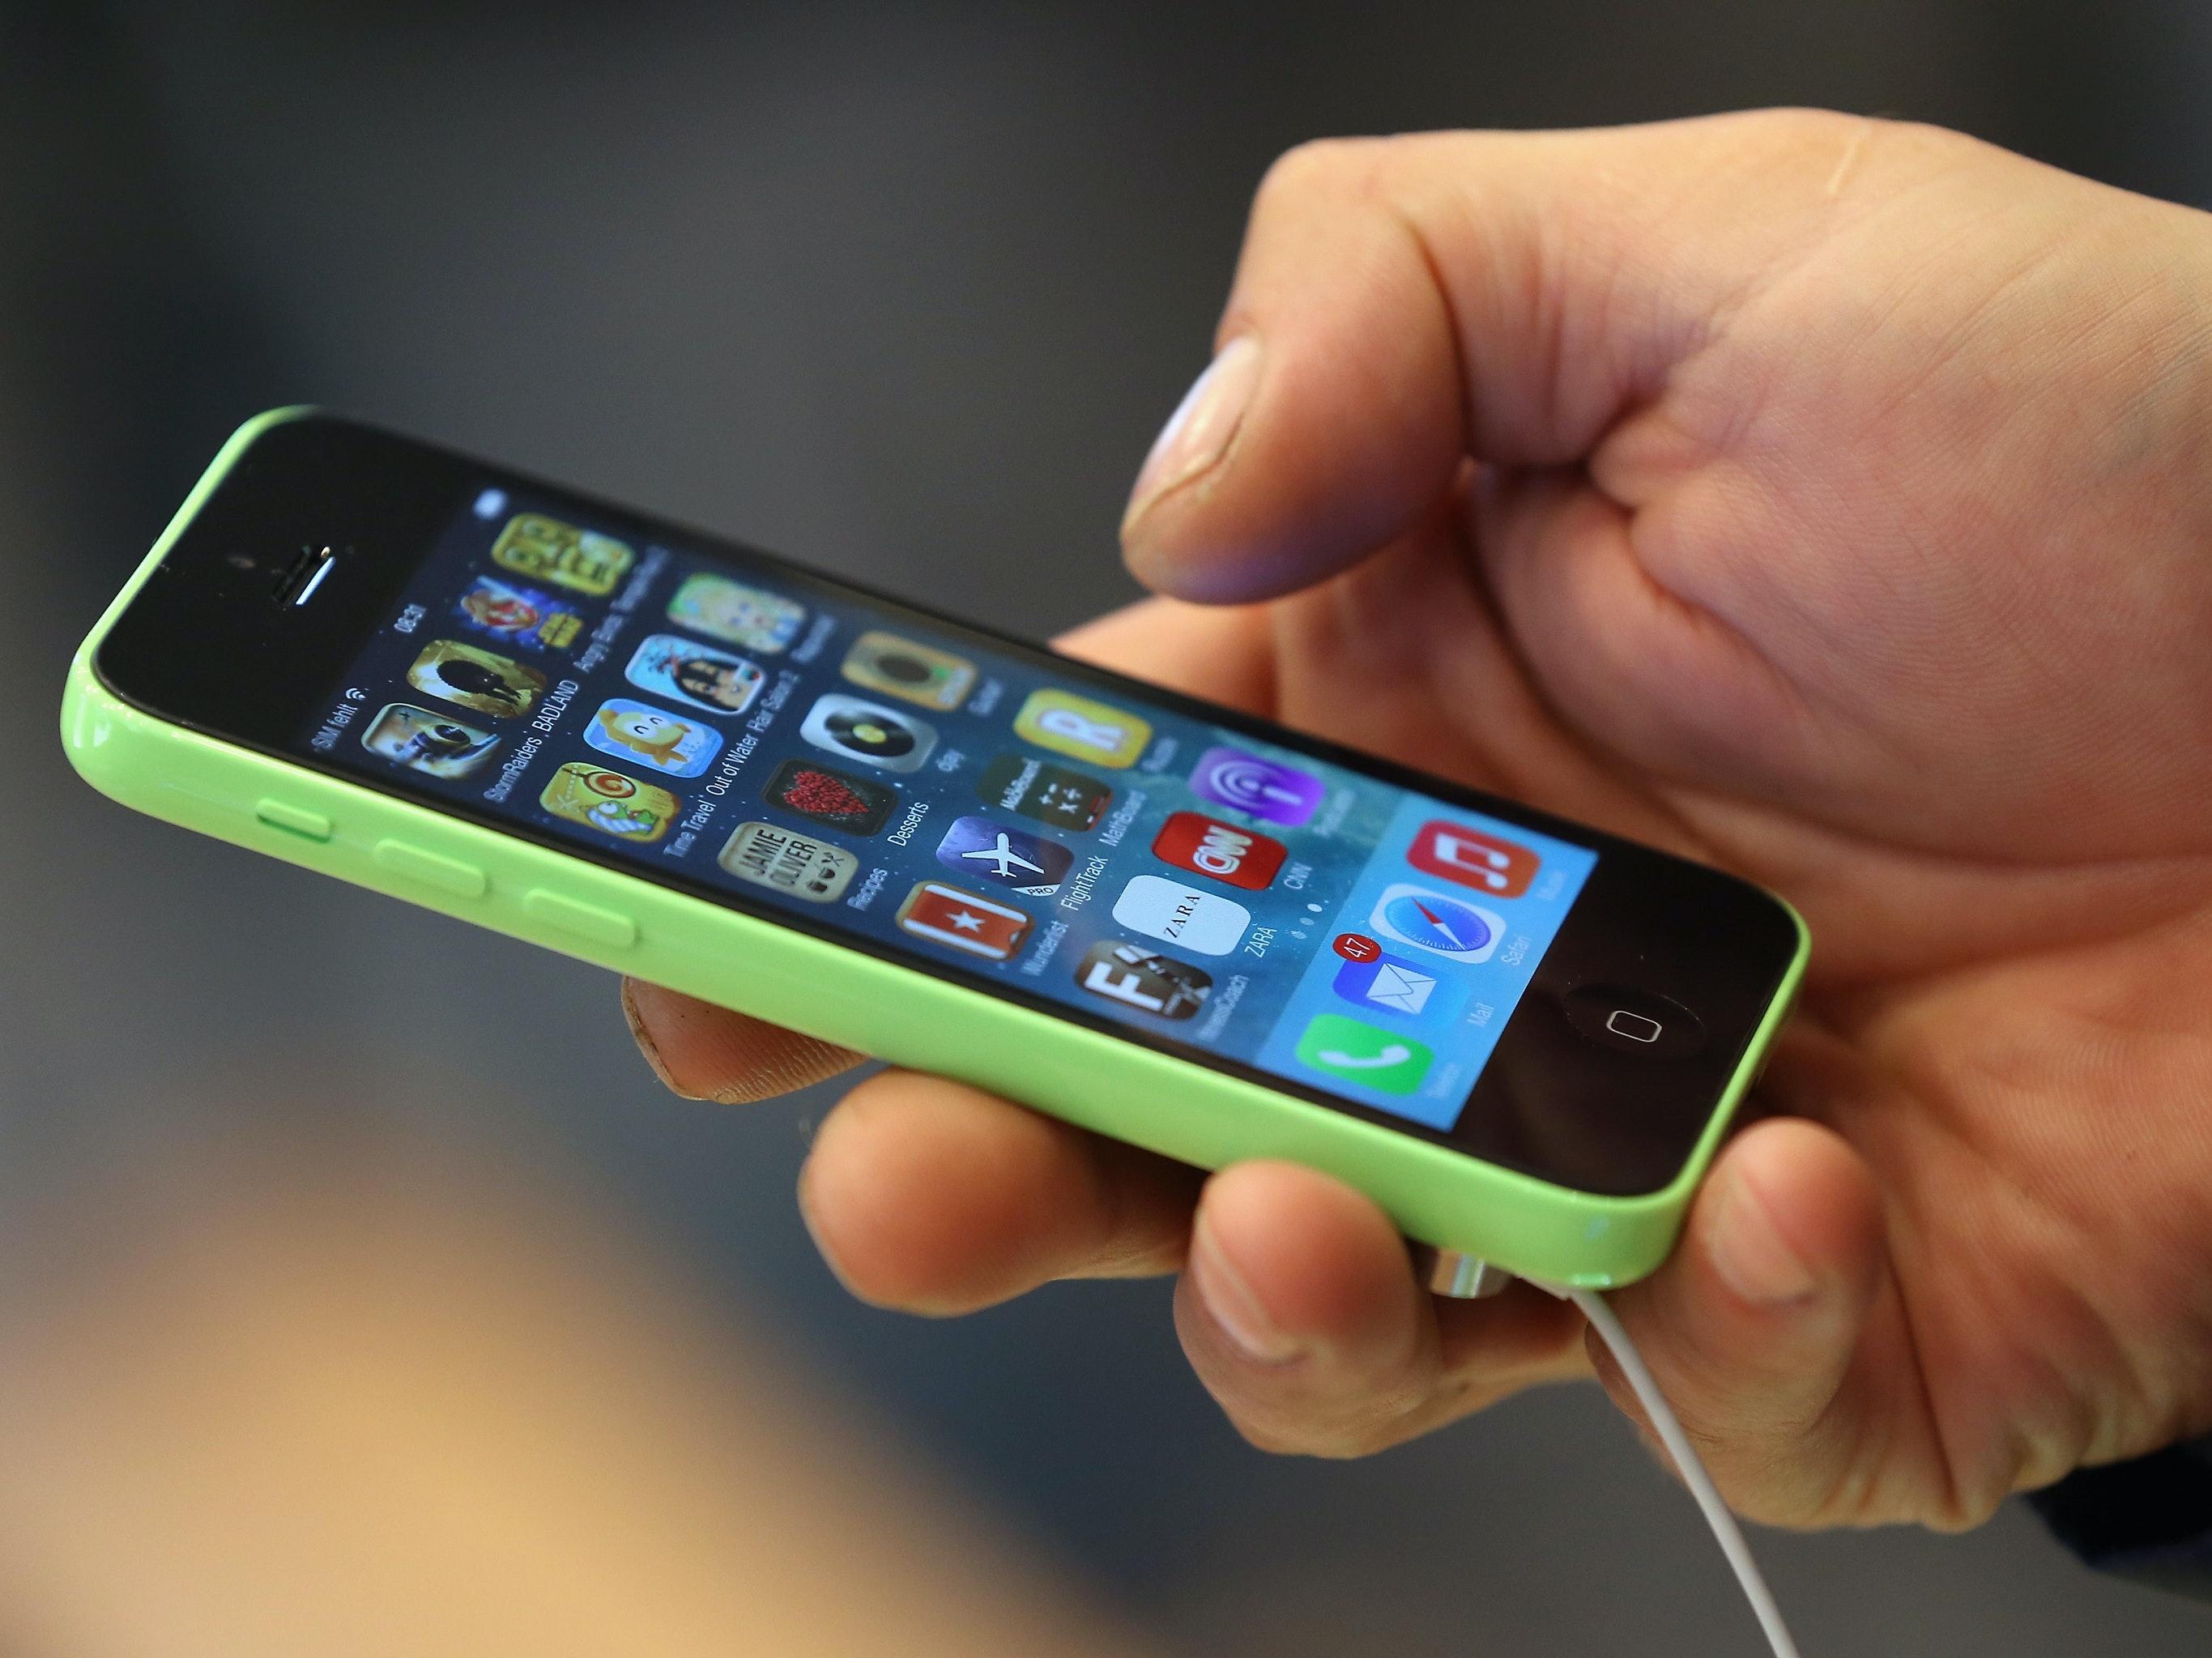 Israeli Hackers Just Blew the iPhone's Security Wide Open